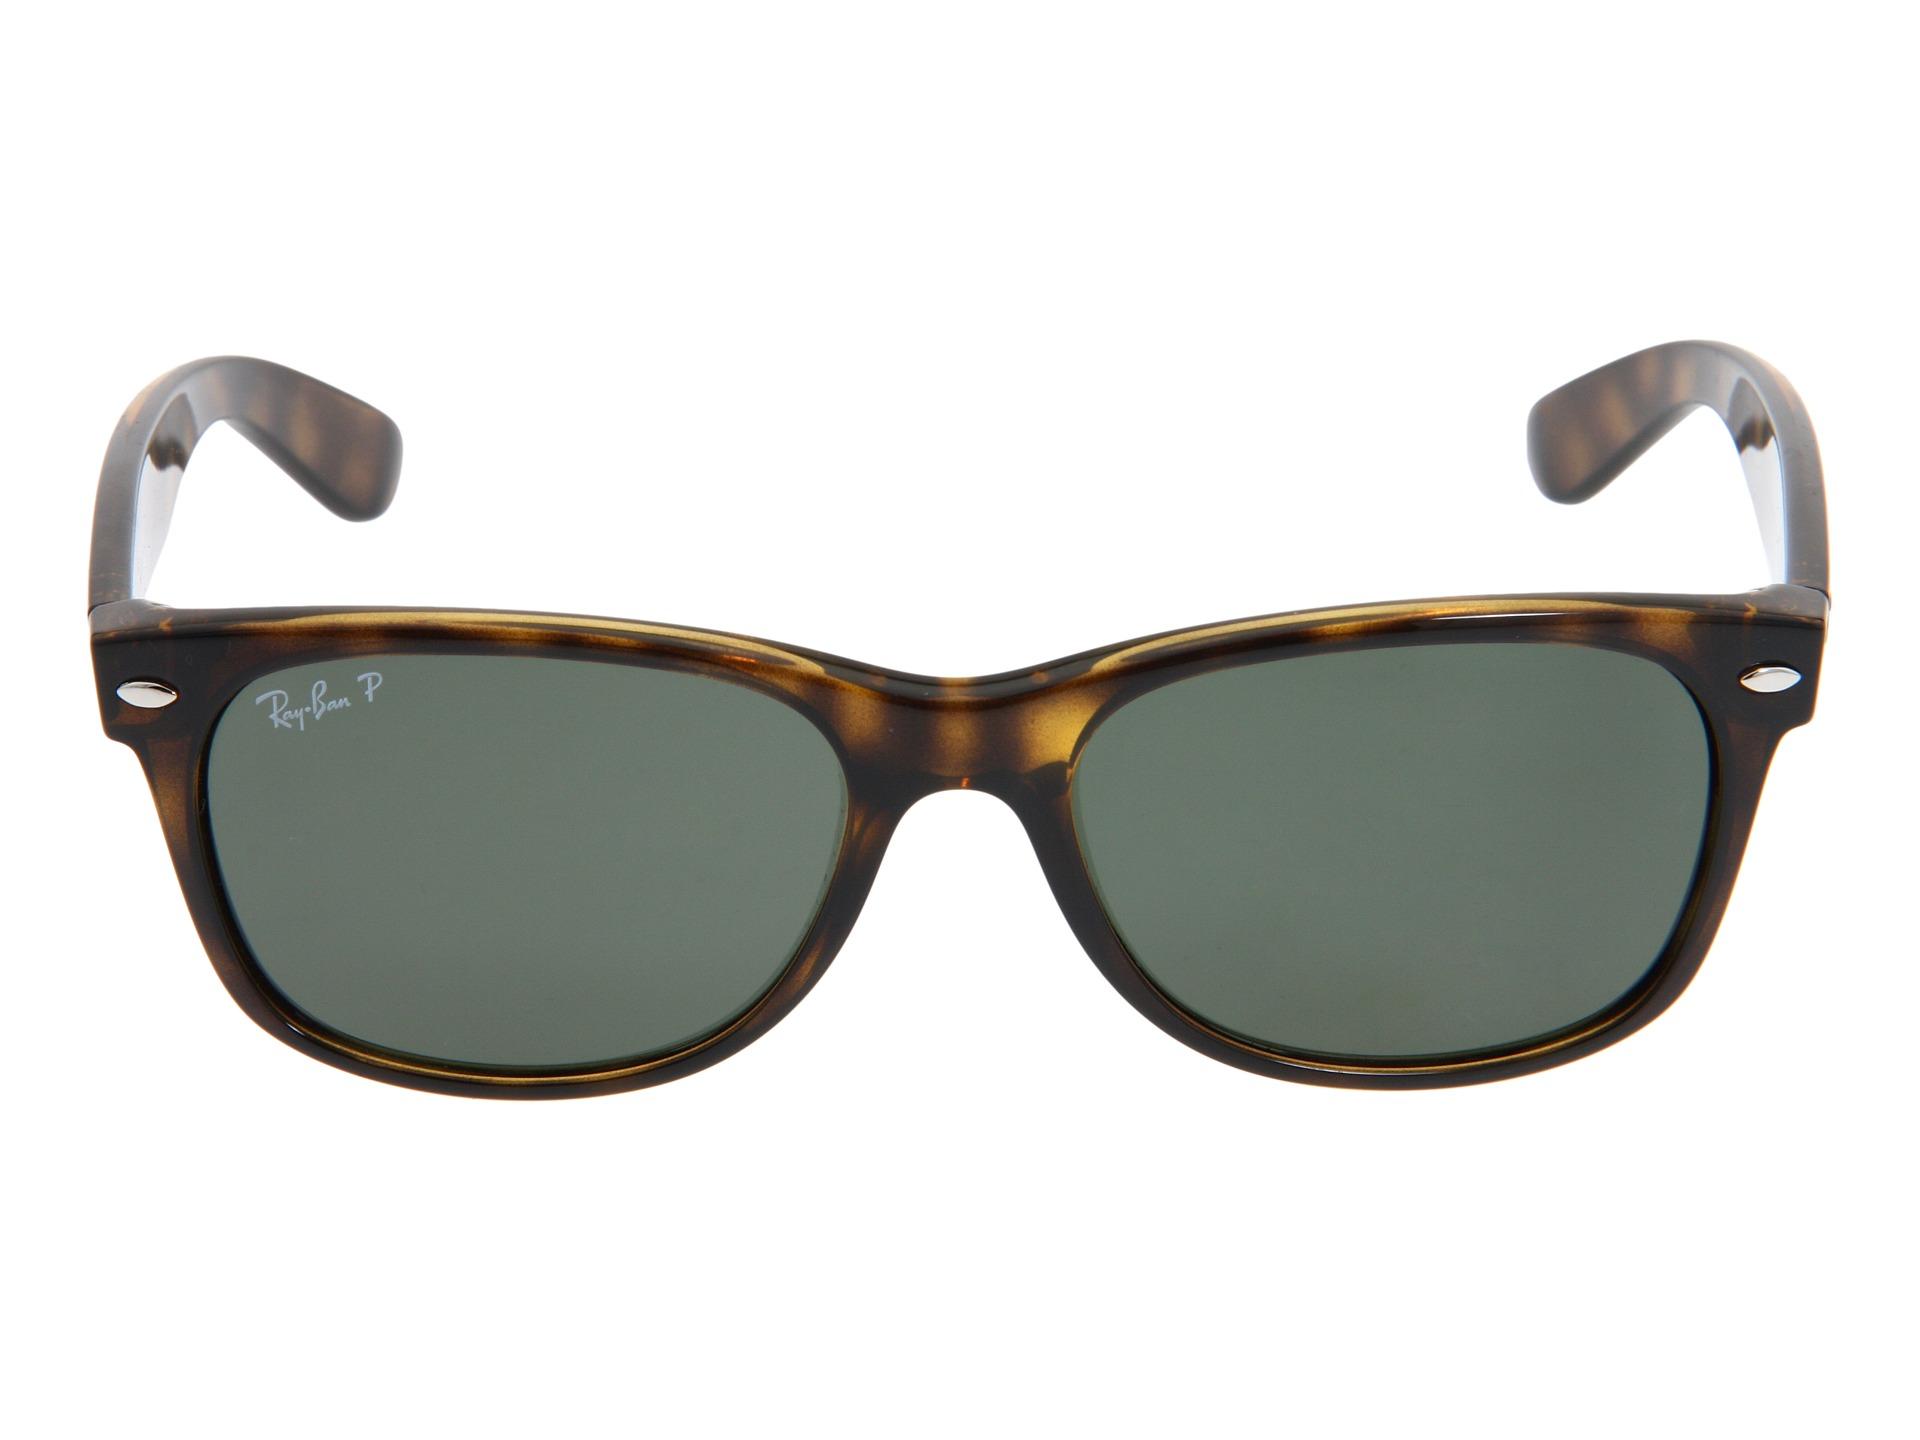 9c86c9eb37 Ray Ban Rb 2132 55 Polarized Fishing Glasses « Heritage Malta